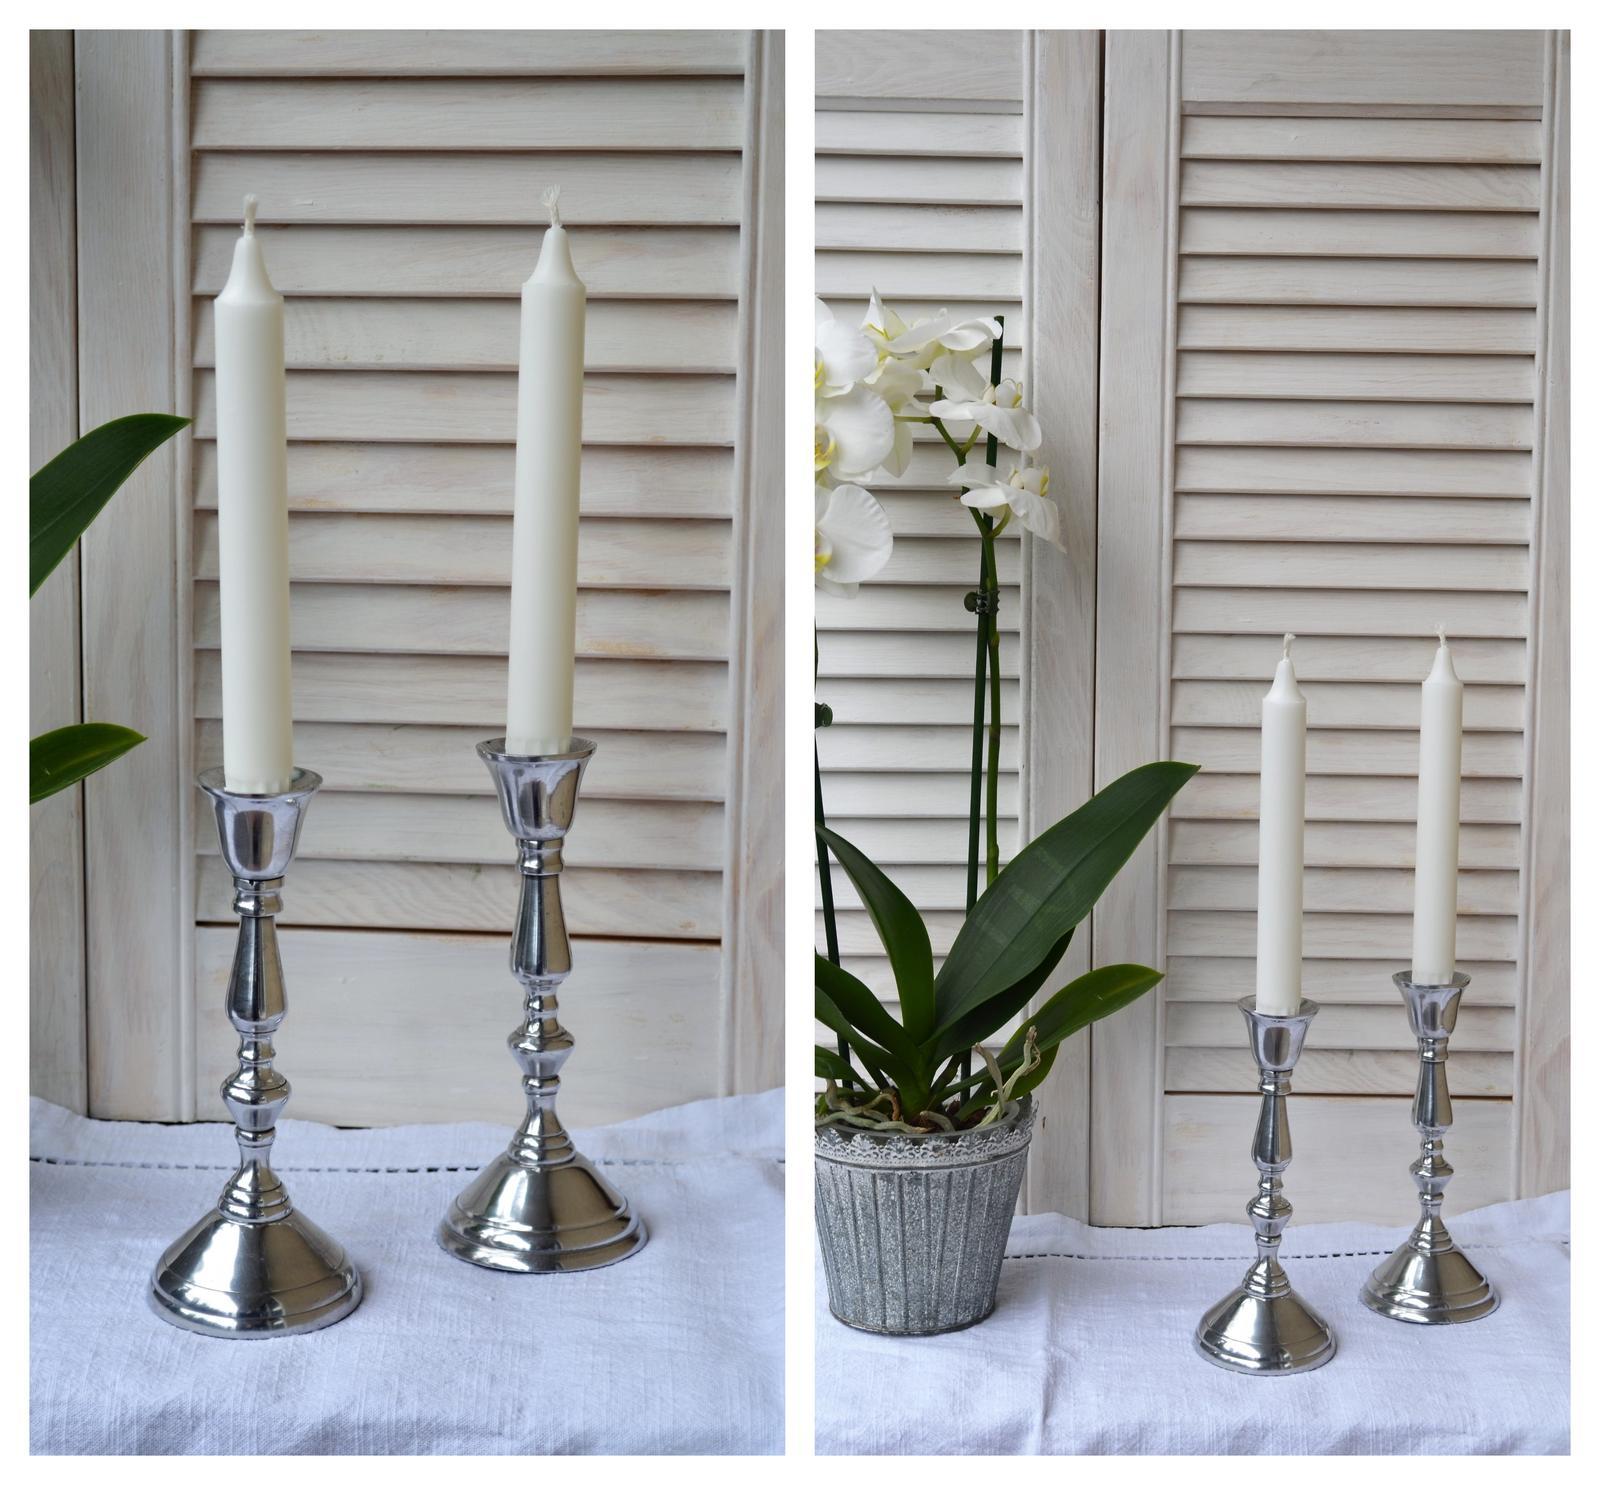 Svietnik na kónickú sviečku - Obrázok č. 2